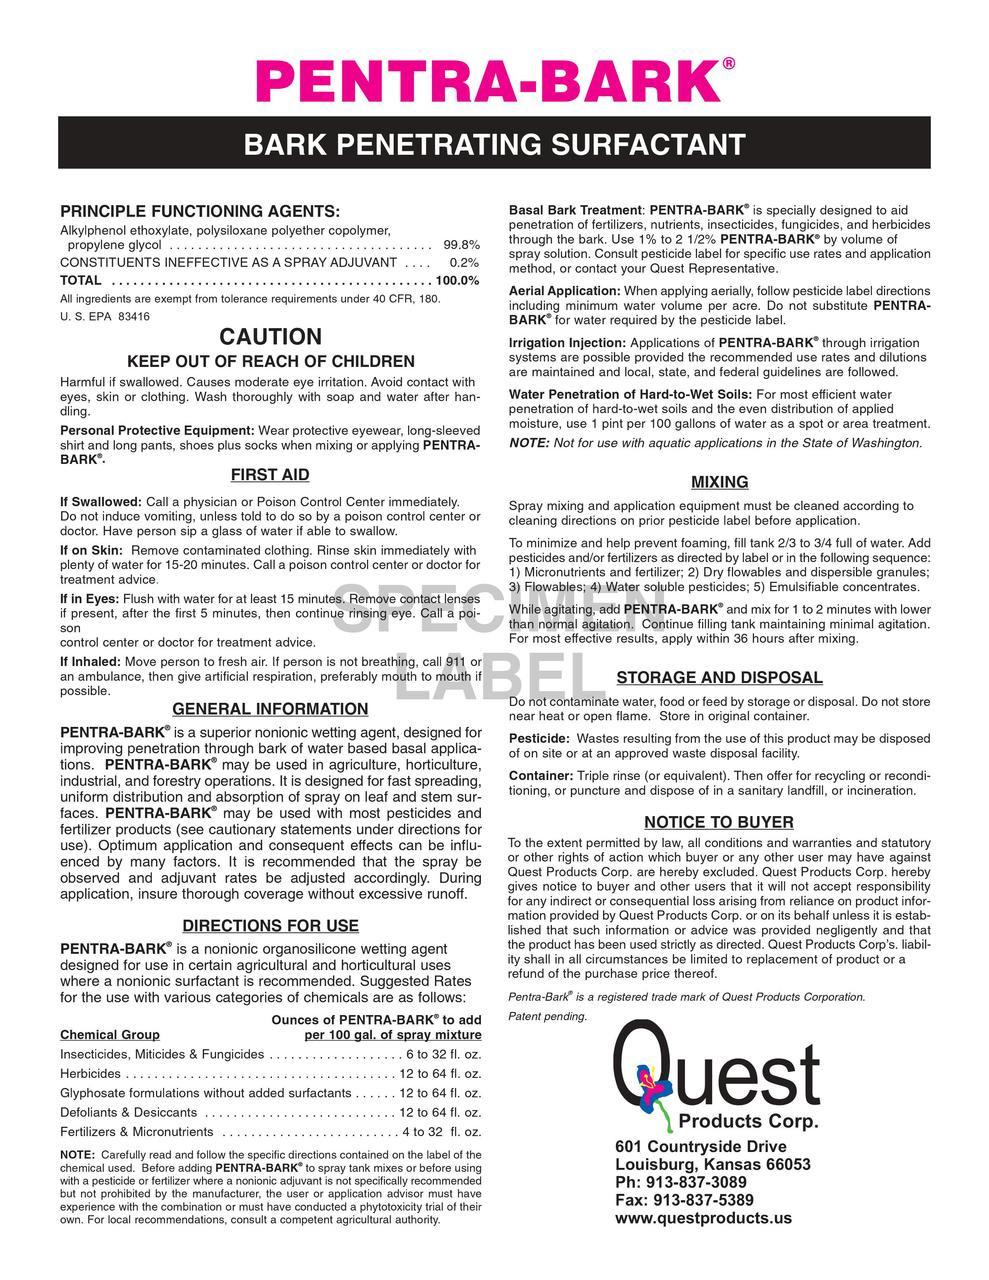 Pentra Bark Penetrating Surfactant - Quart (32oz)